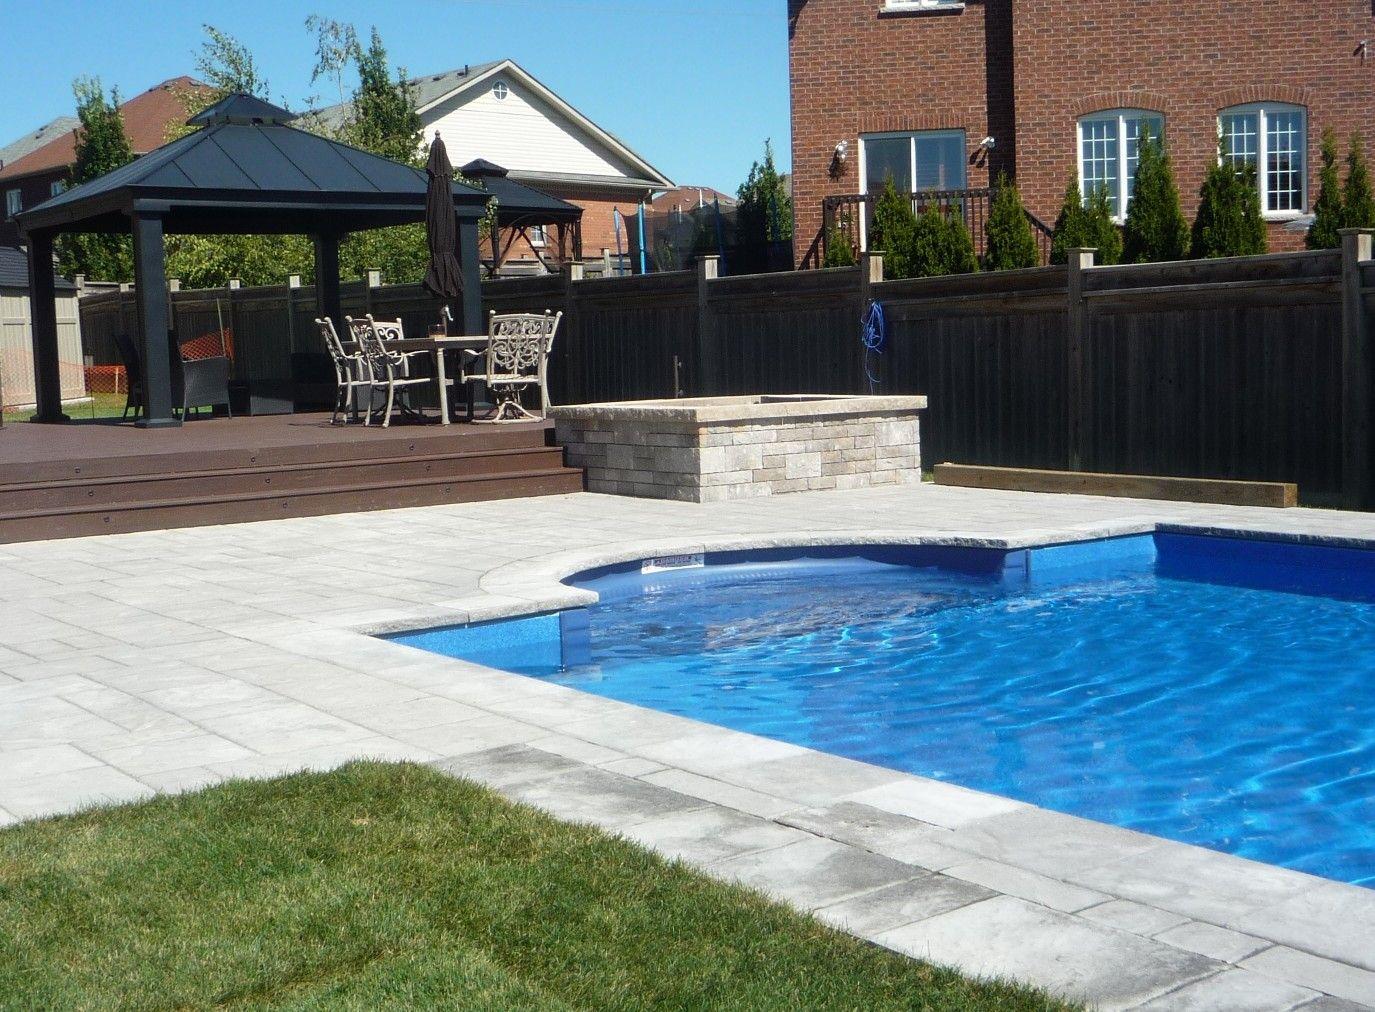 Swimming Pool Interlocking Pool Deck Composite Deck With Cabana